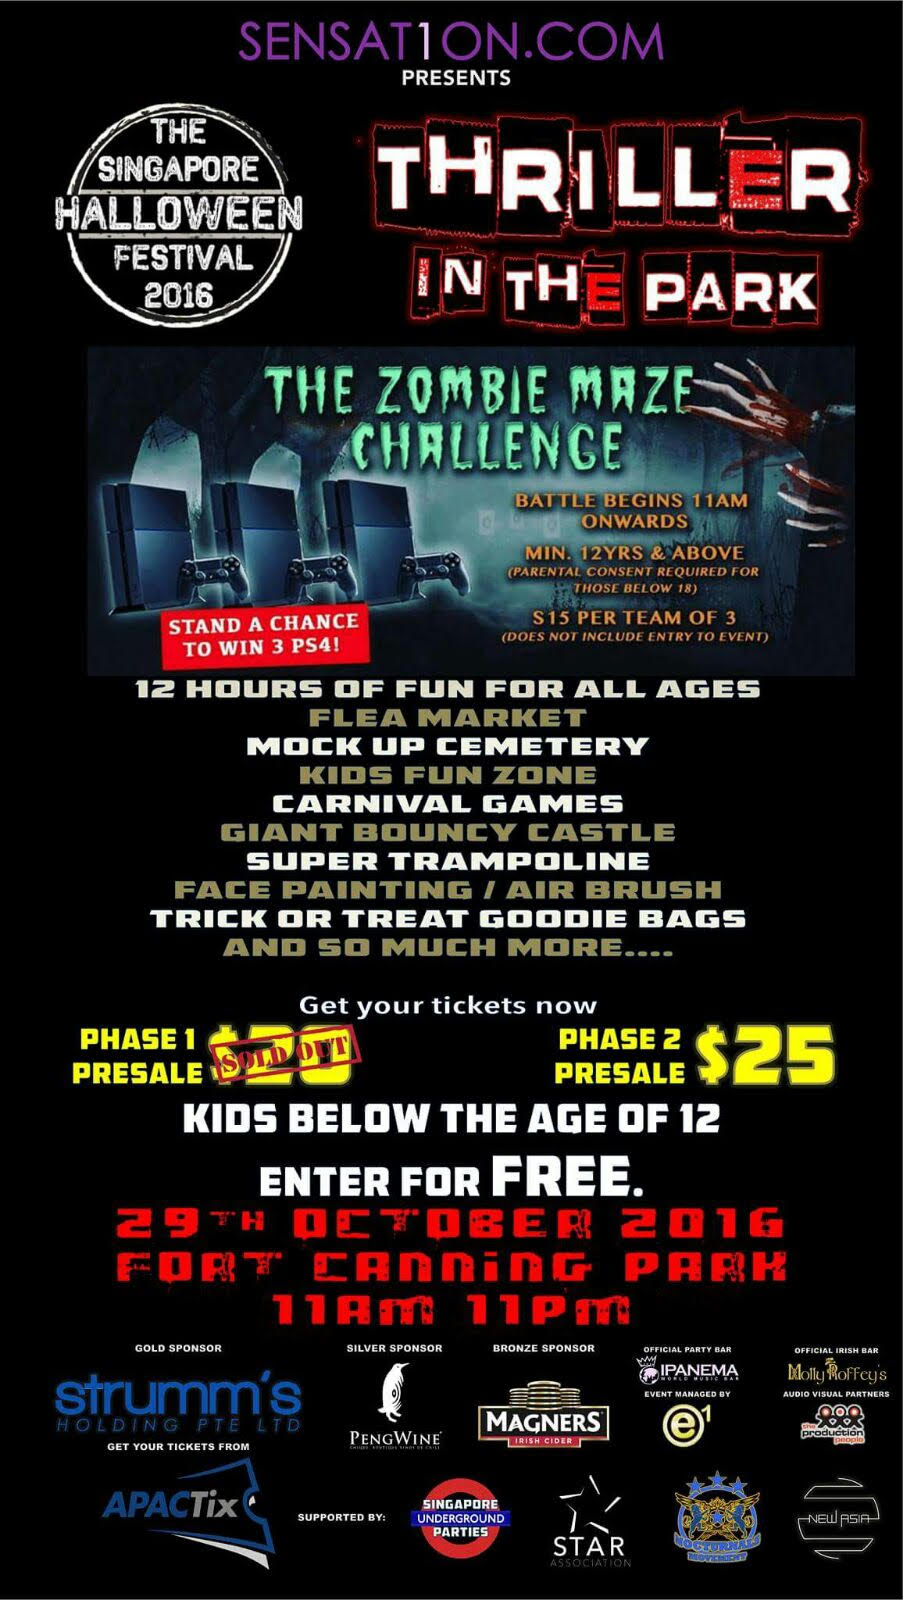 Halloween-events-venuerific-blog-world-war-z